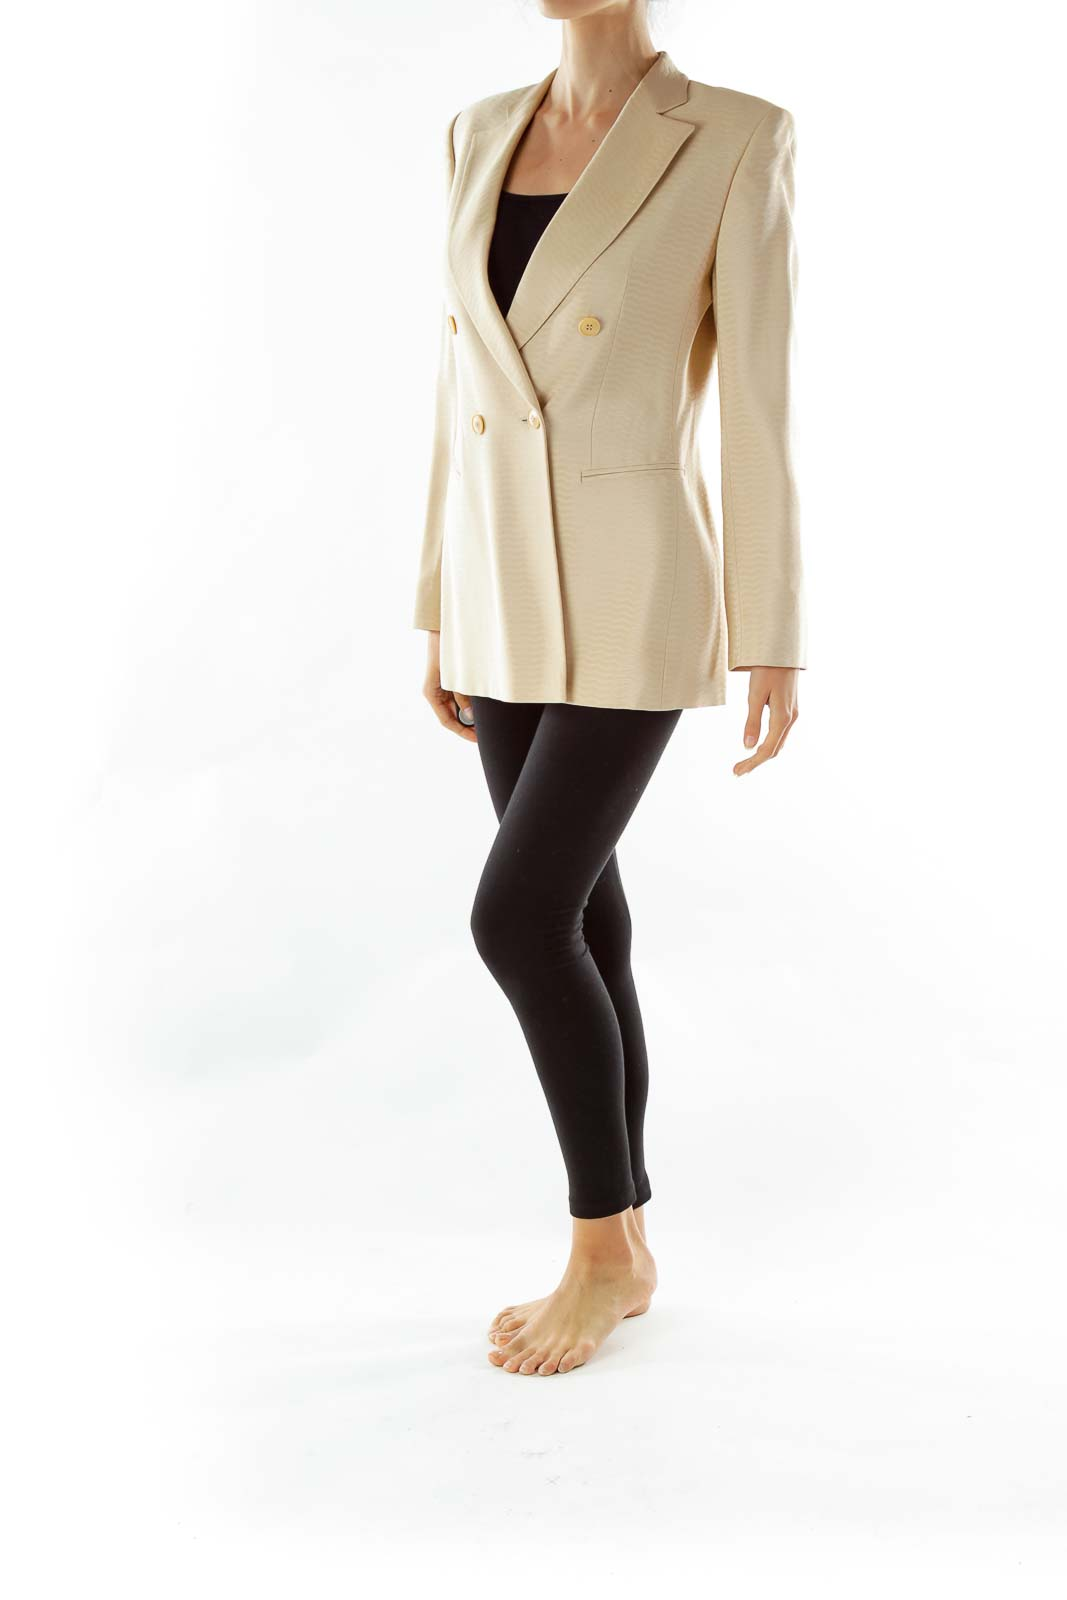 Beige Double-Breasted Designer Suit Jacket